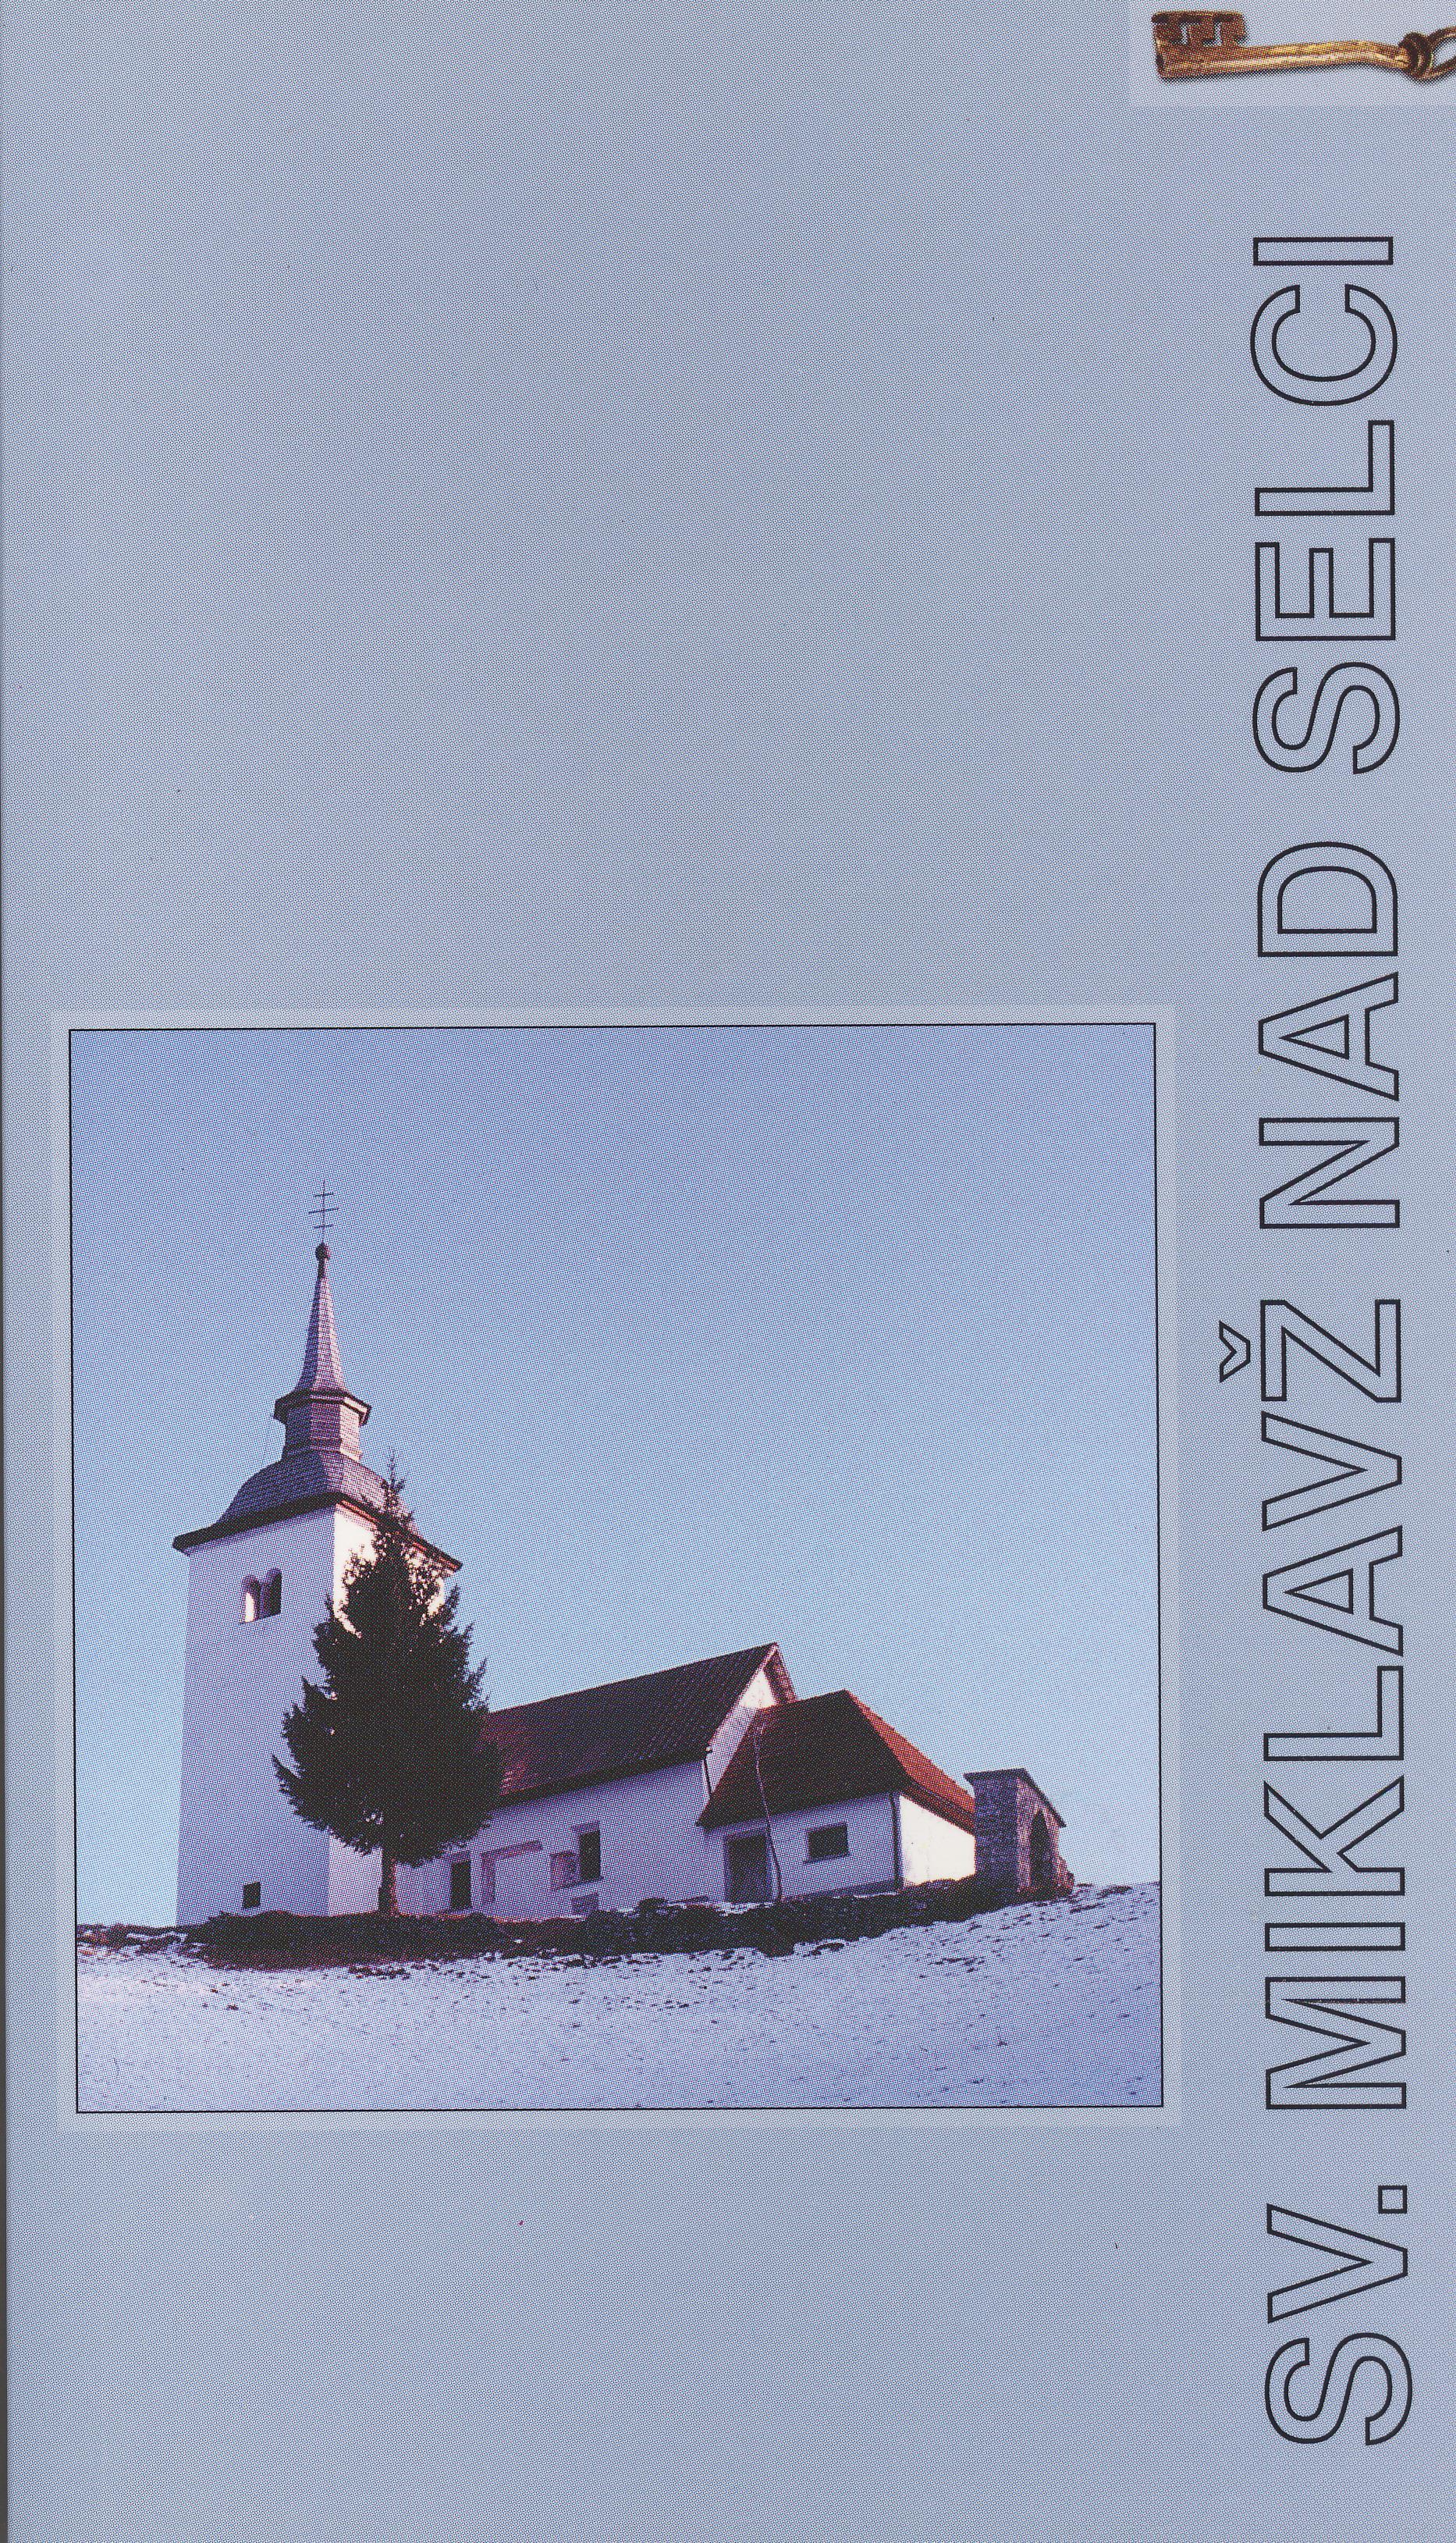 SV. MIKLAVŽ NAD SELCI Book Cover